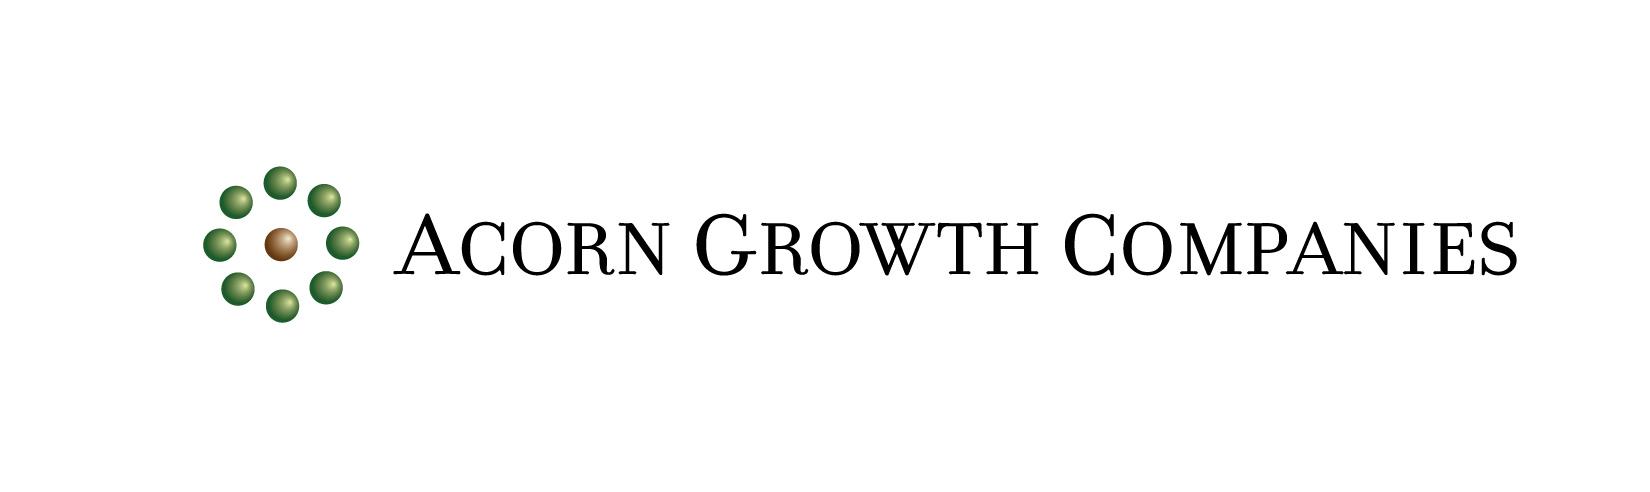 Acorn Growth Companies, LLC